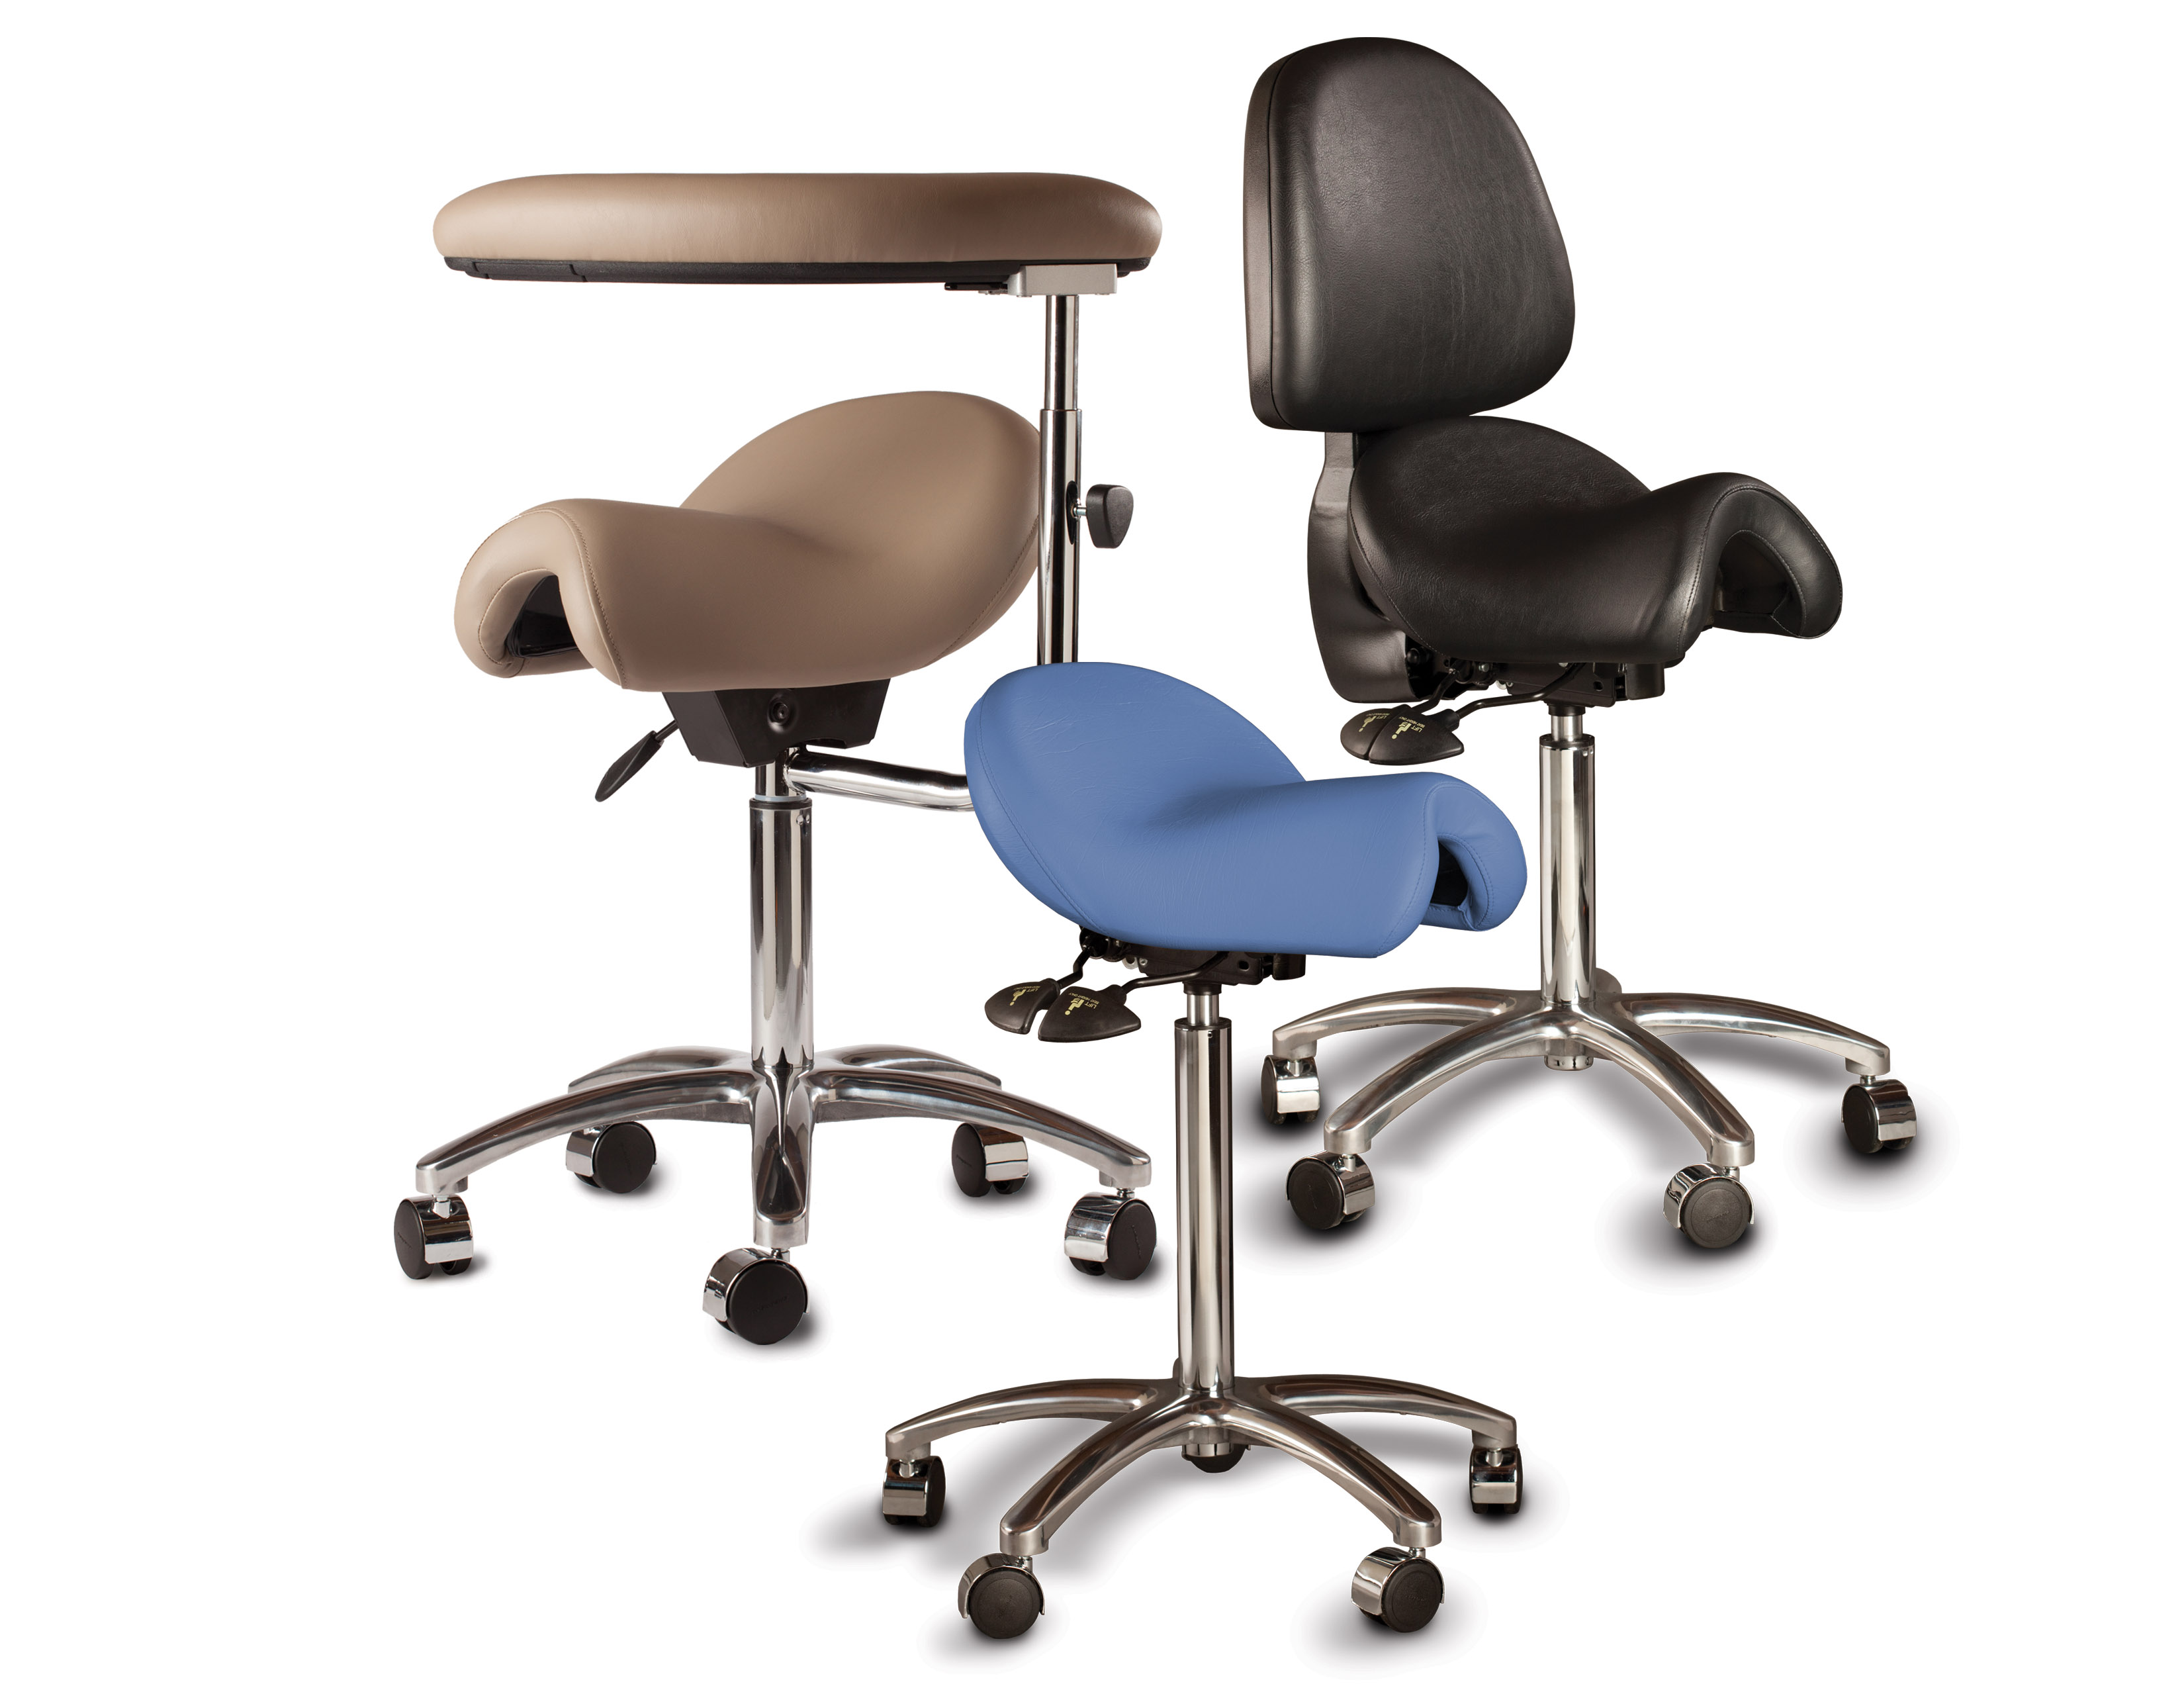 Bambach Ergonomic Saddle Seat